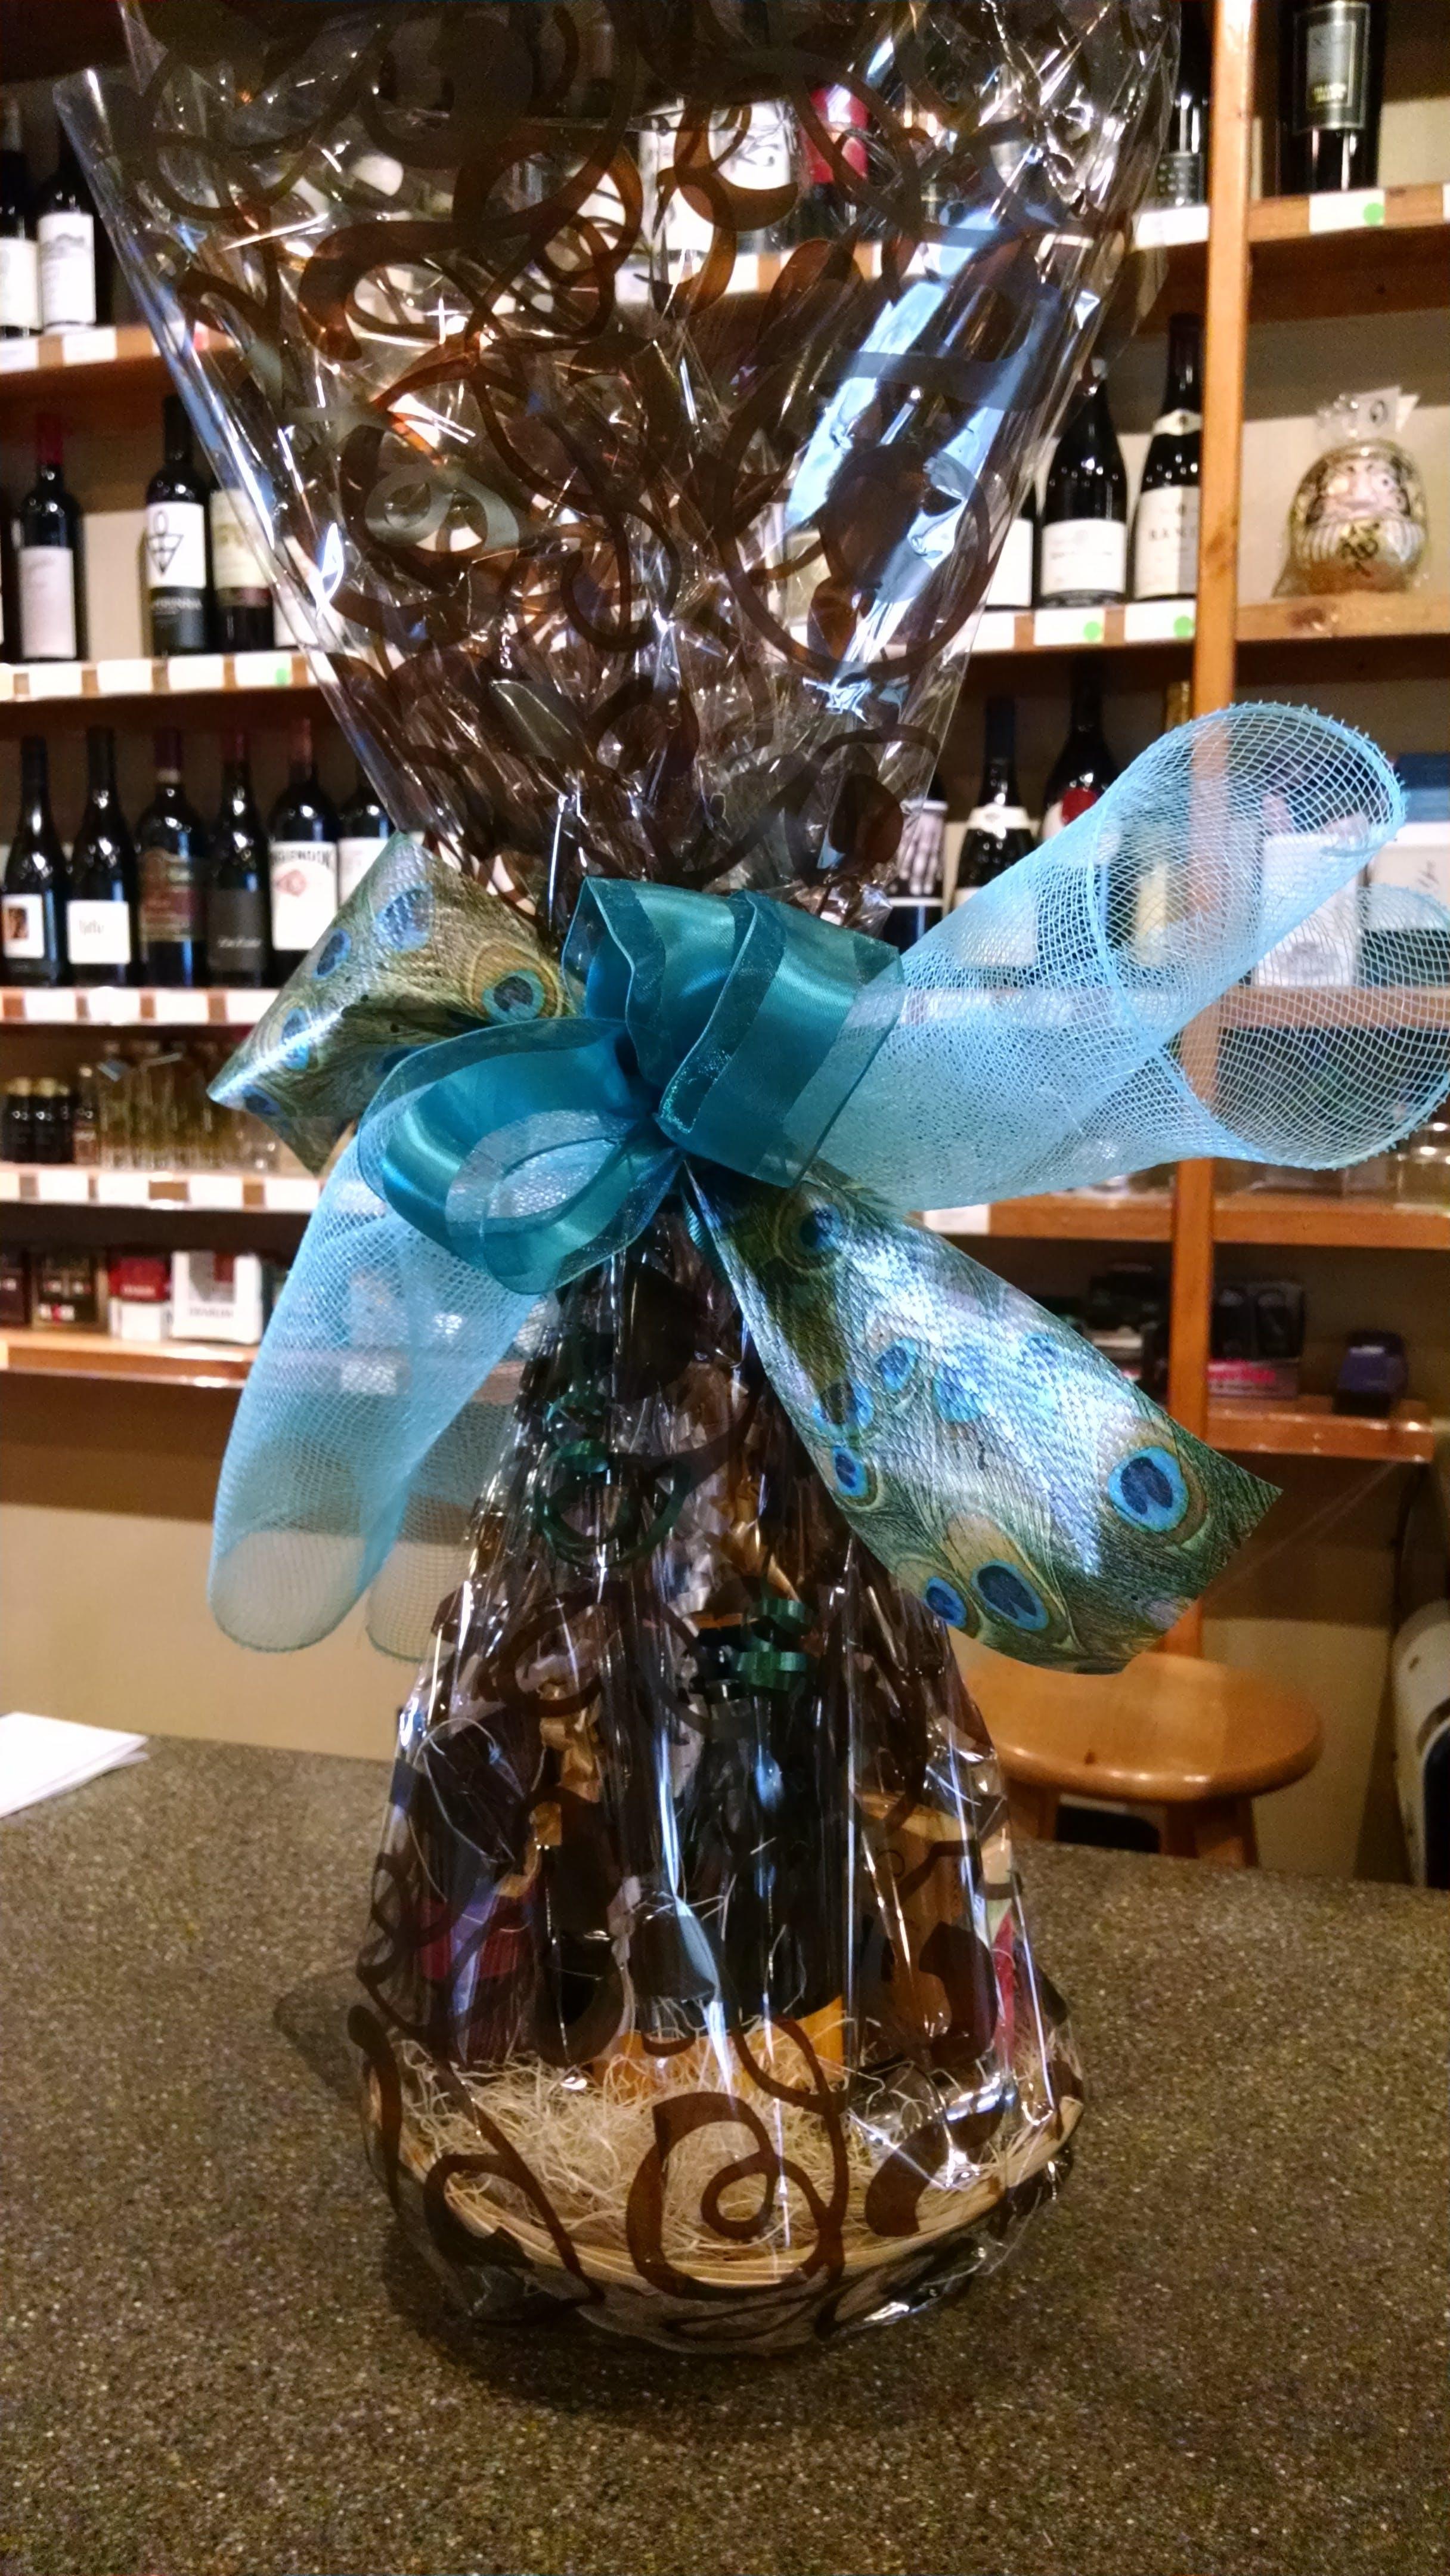 Kona Wine Club Sparkling Wine and Chocolate Gift Basket 750ml - Kona Wine Market